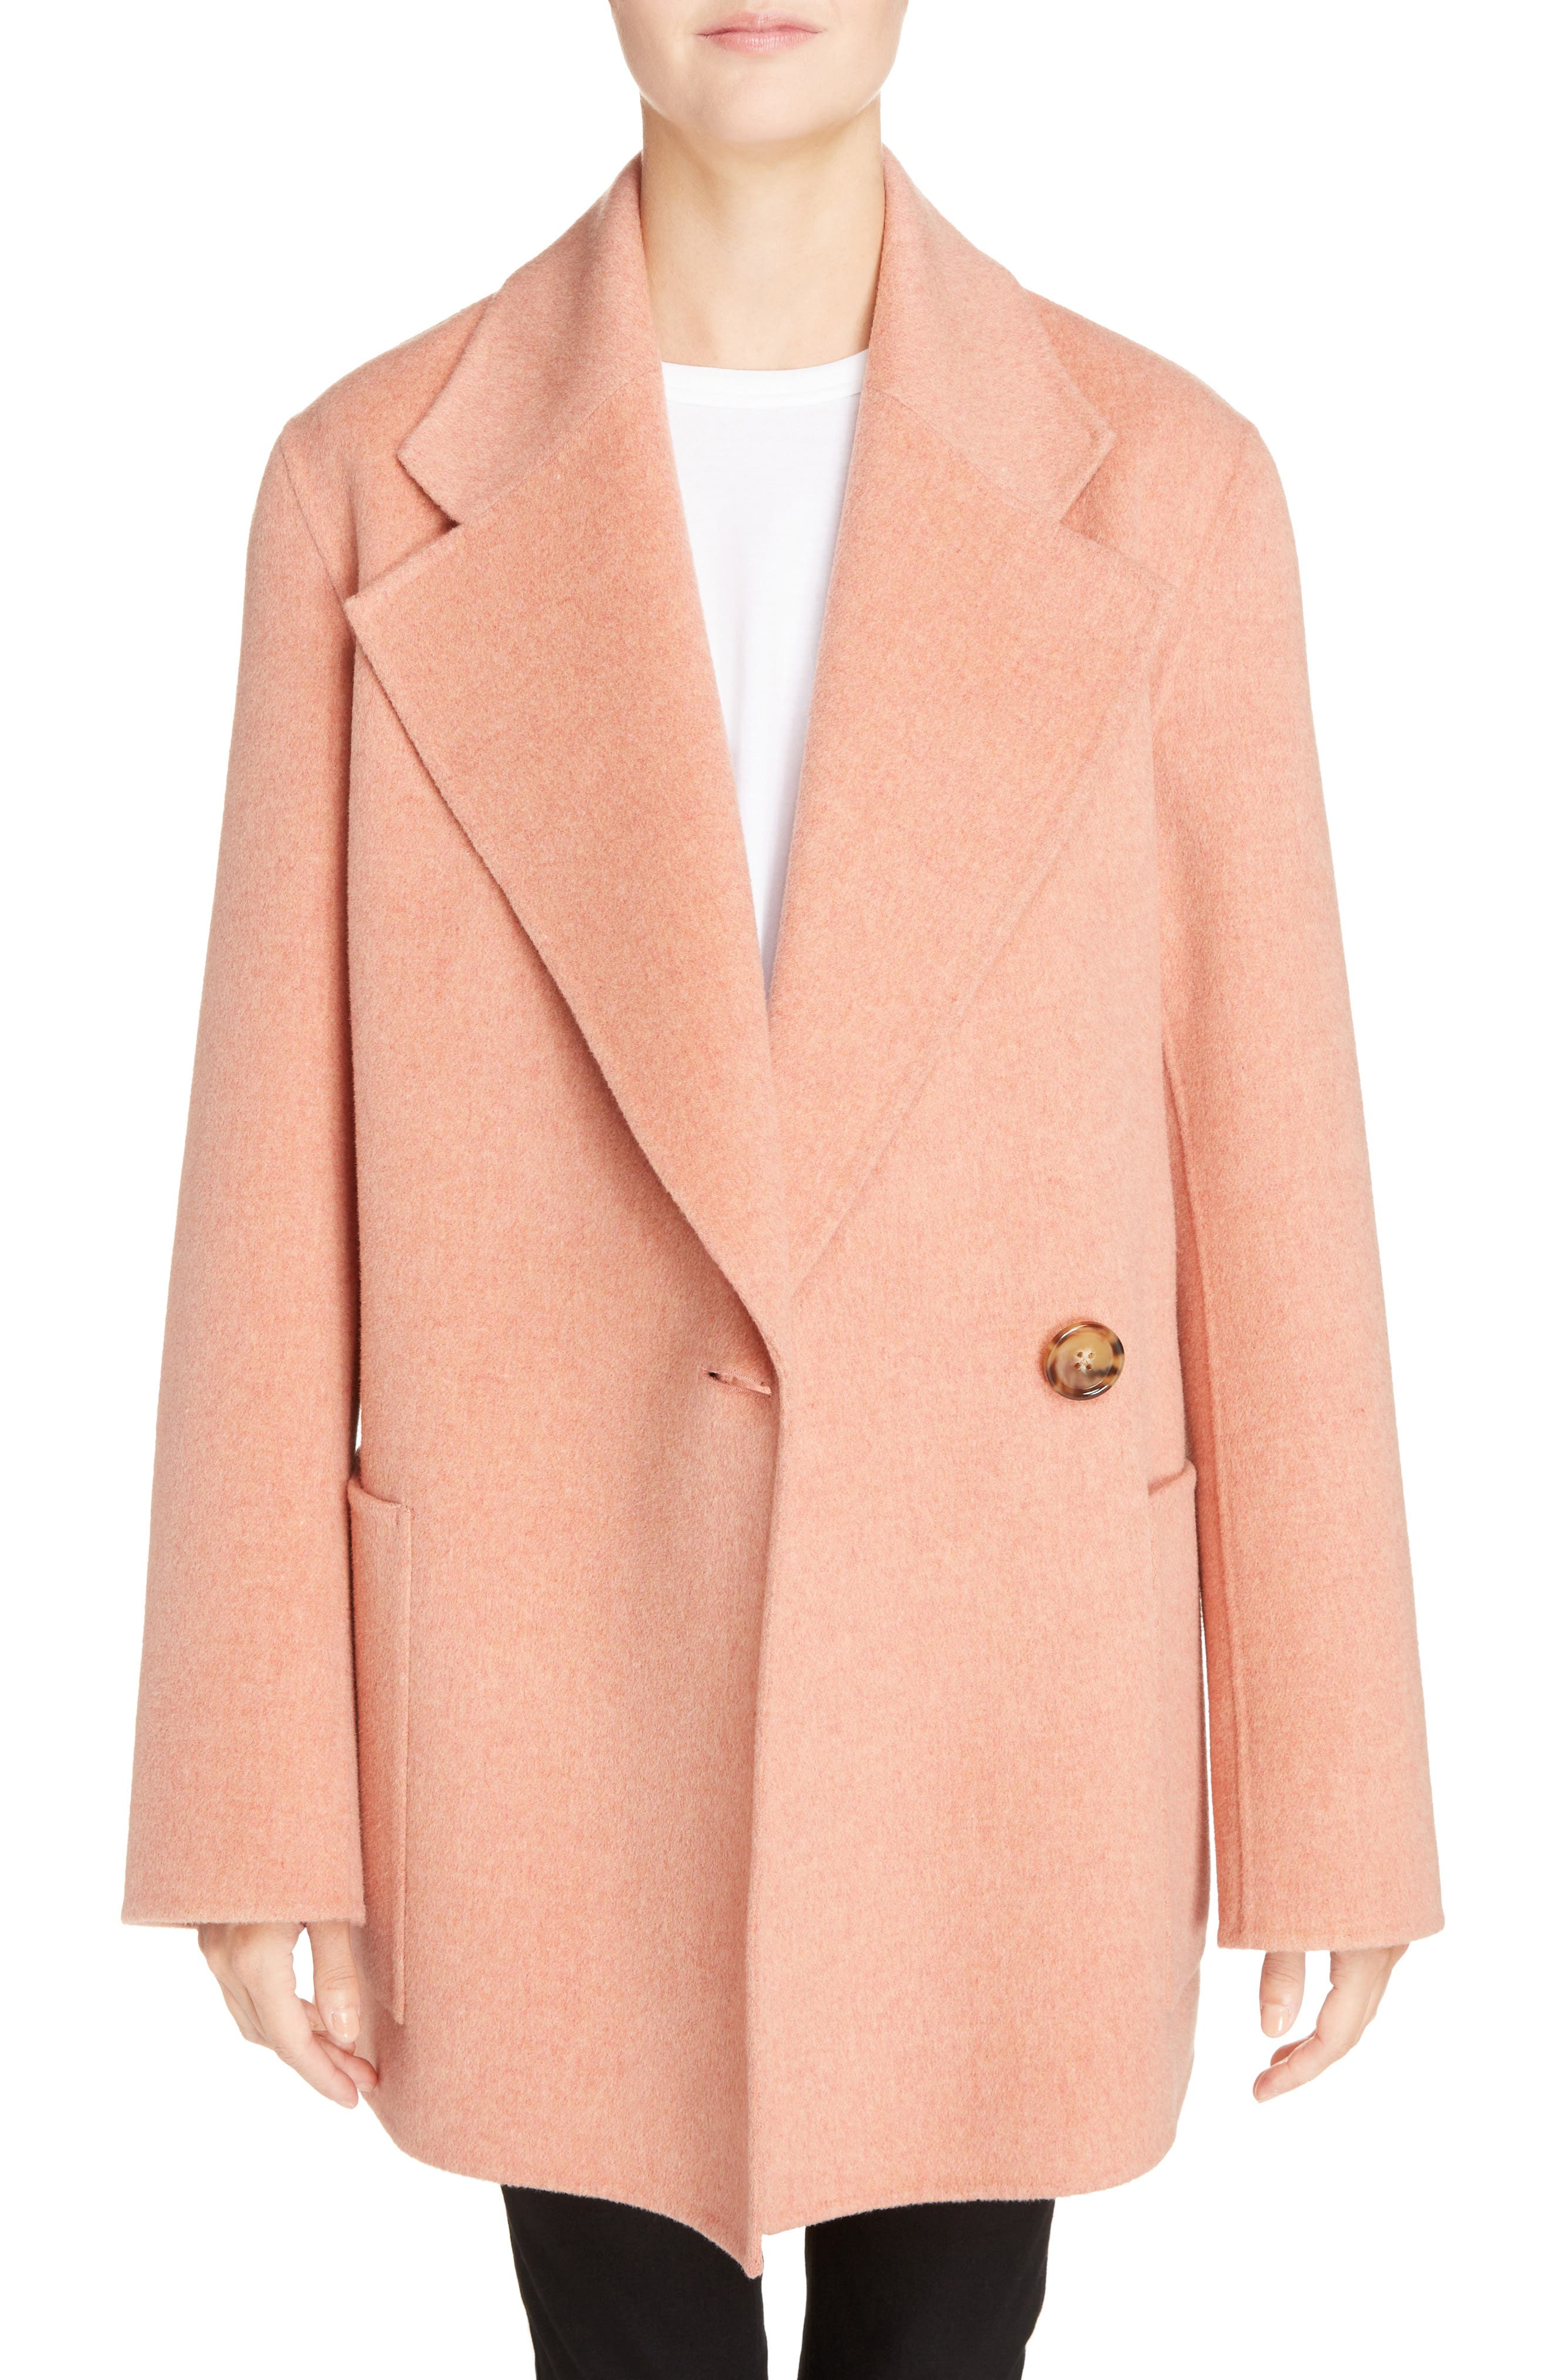 Anika Doublé Wool & Cashmere Coat,                         Main,                         color, 650